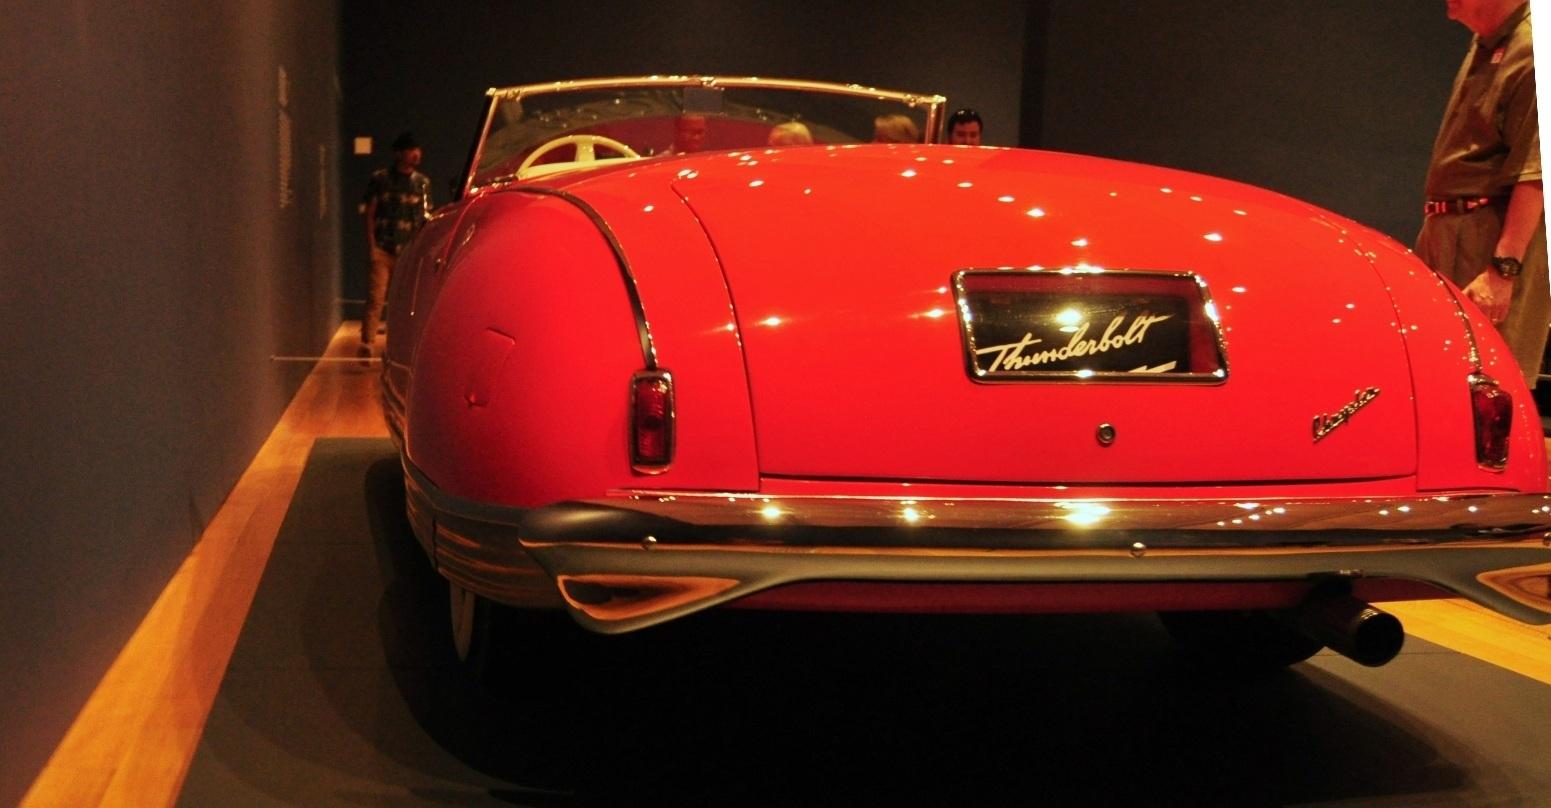 Atlanta Dream Cars Showcase - 1941 Chrysler Thunderbolt Is Aero Convertible Coupe 14